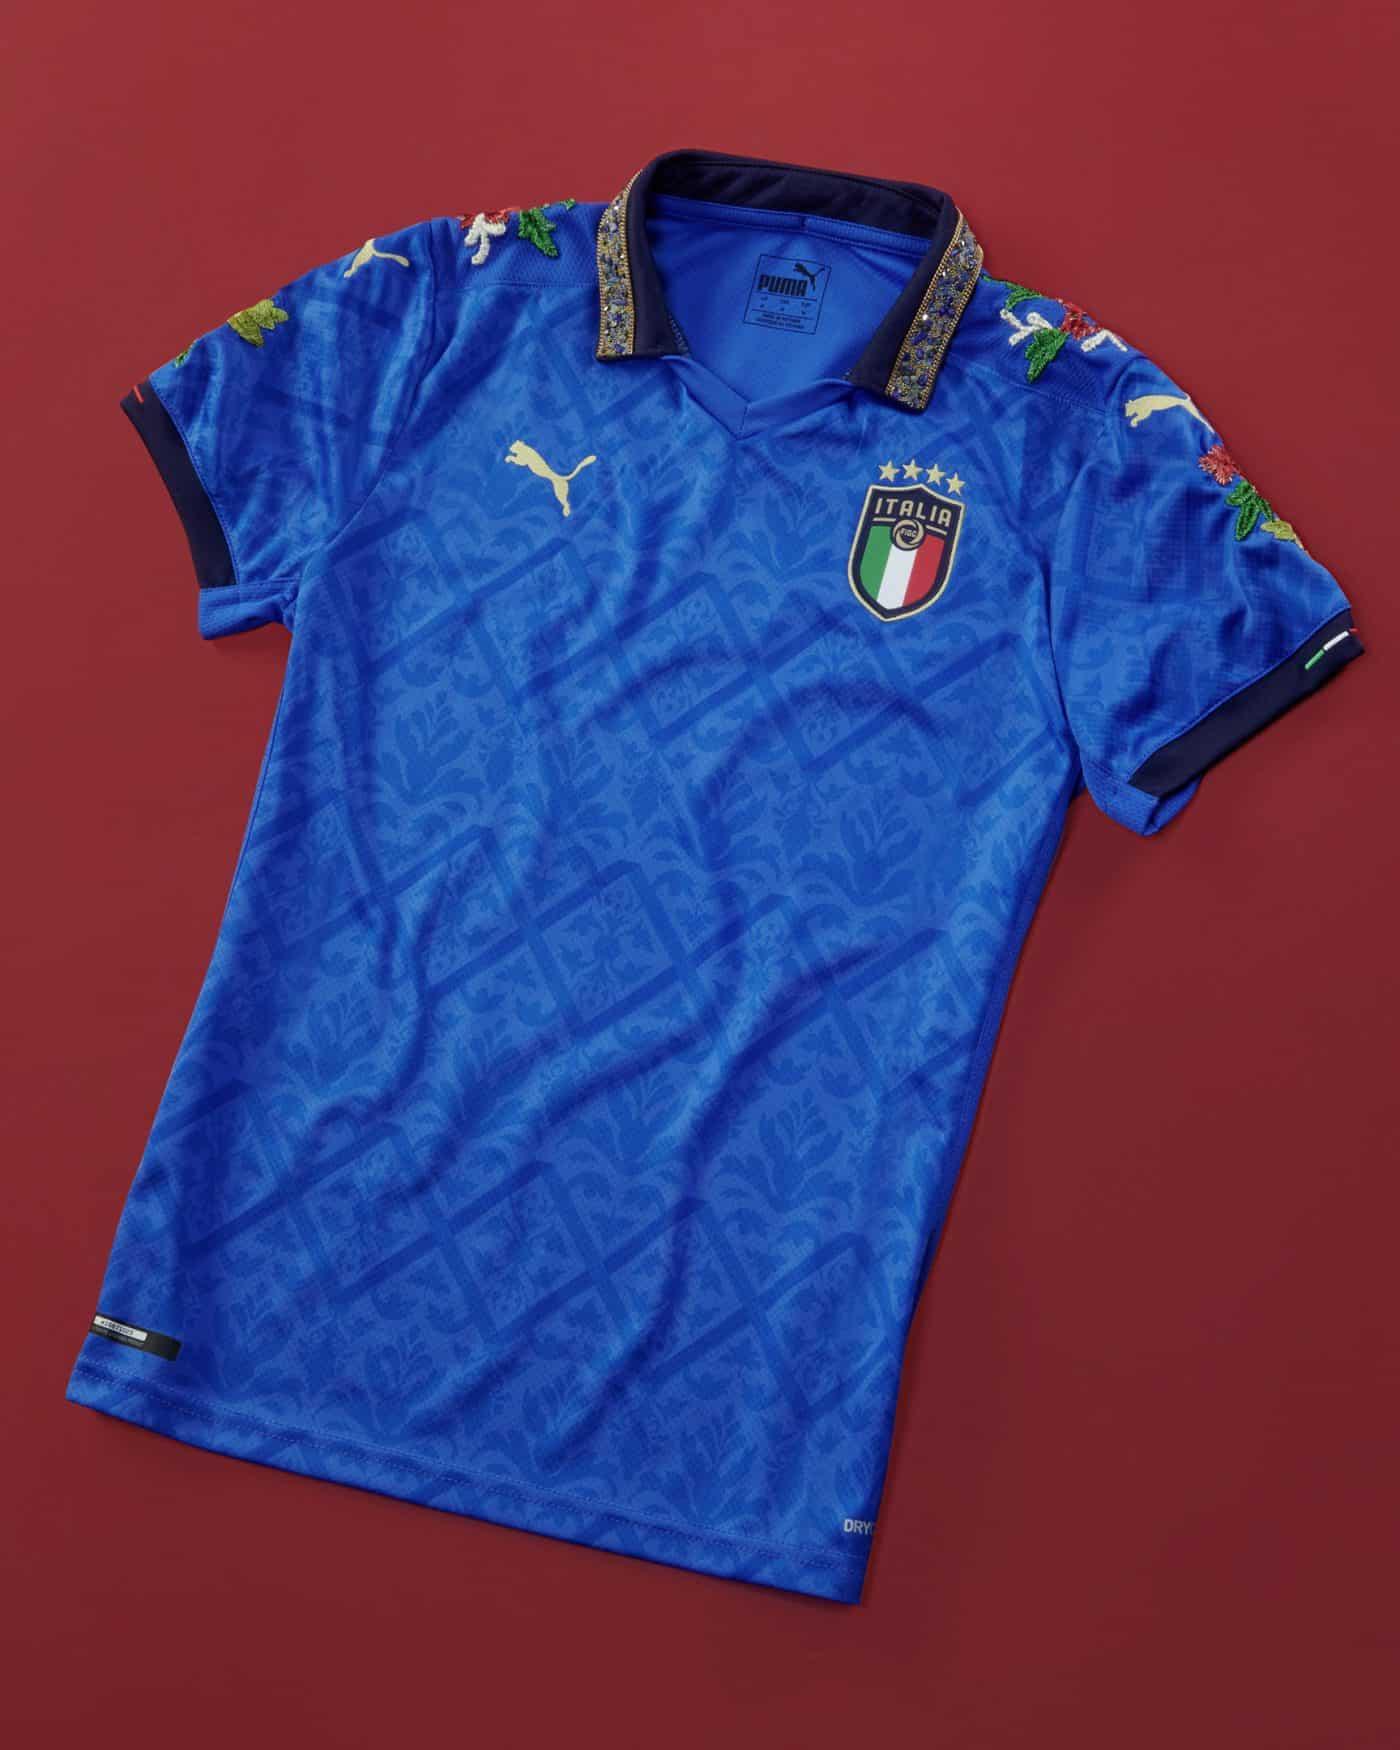 maillot-italie-renaissance-the-football-gall-3